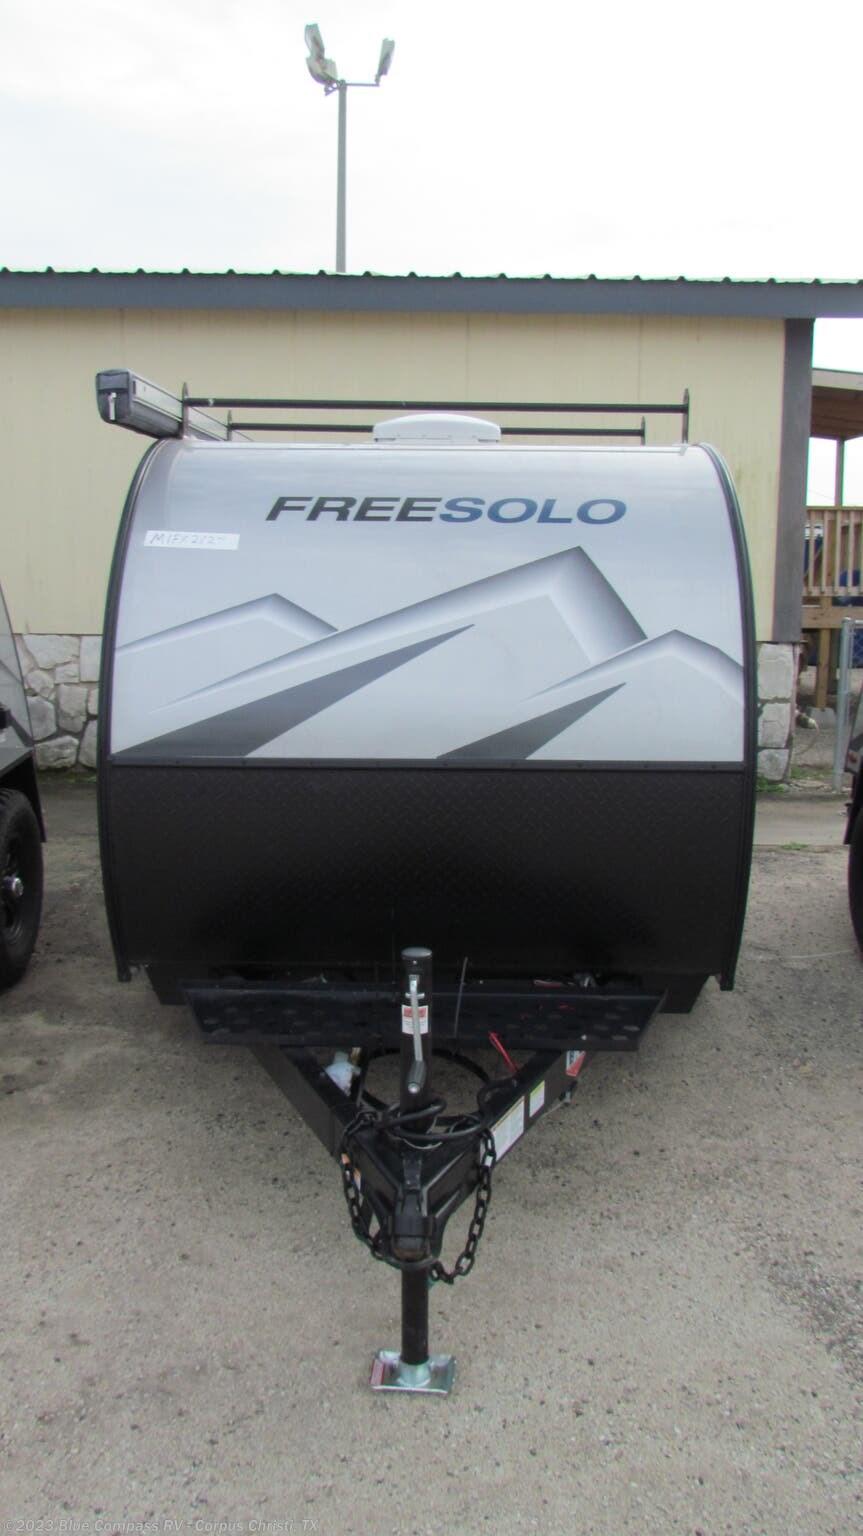 2021 Braxton Creek FREE SOLO OG